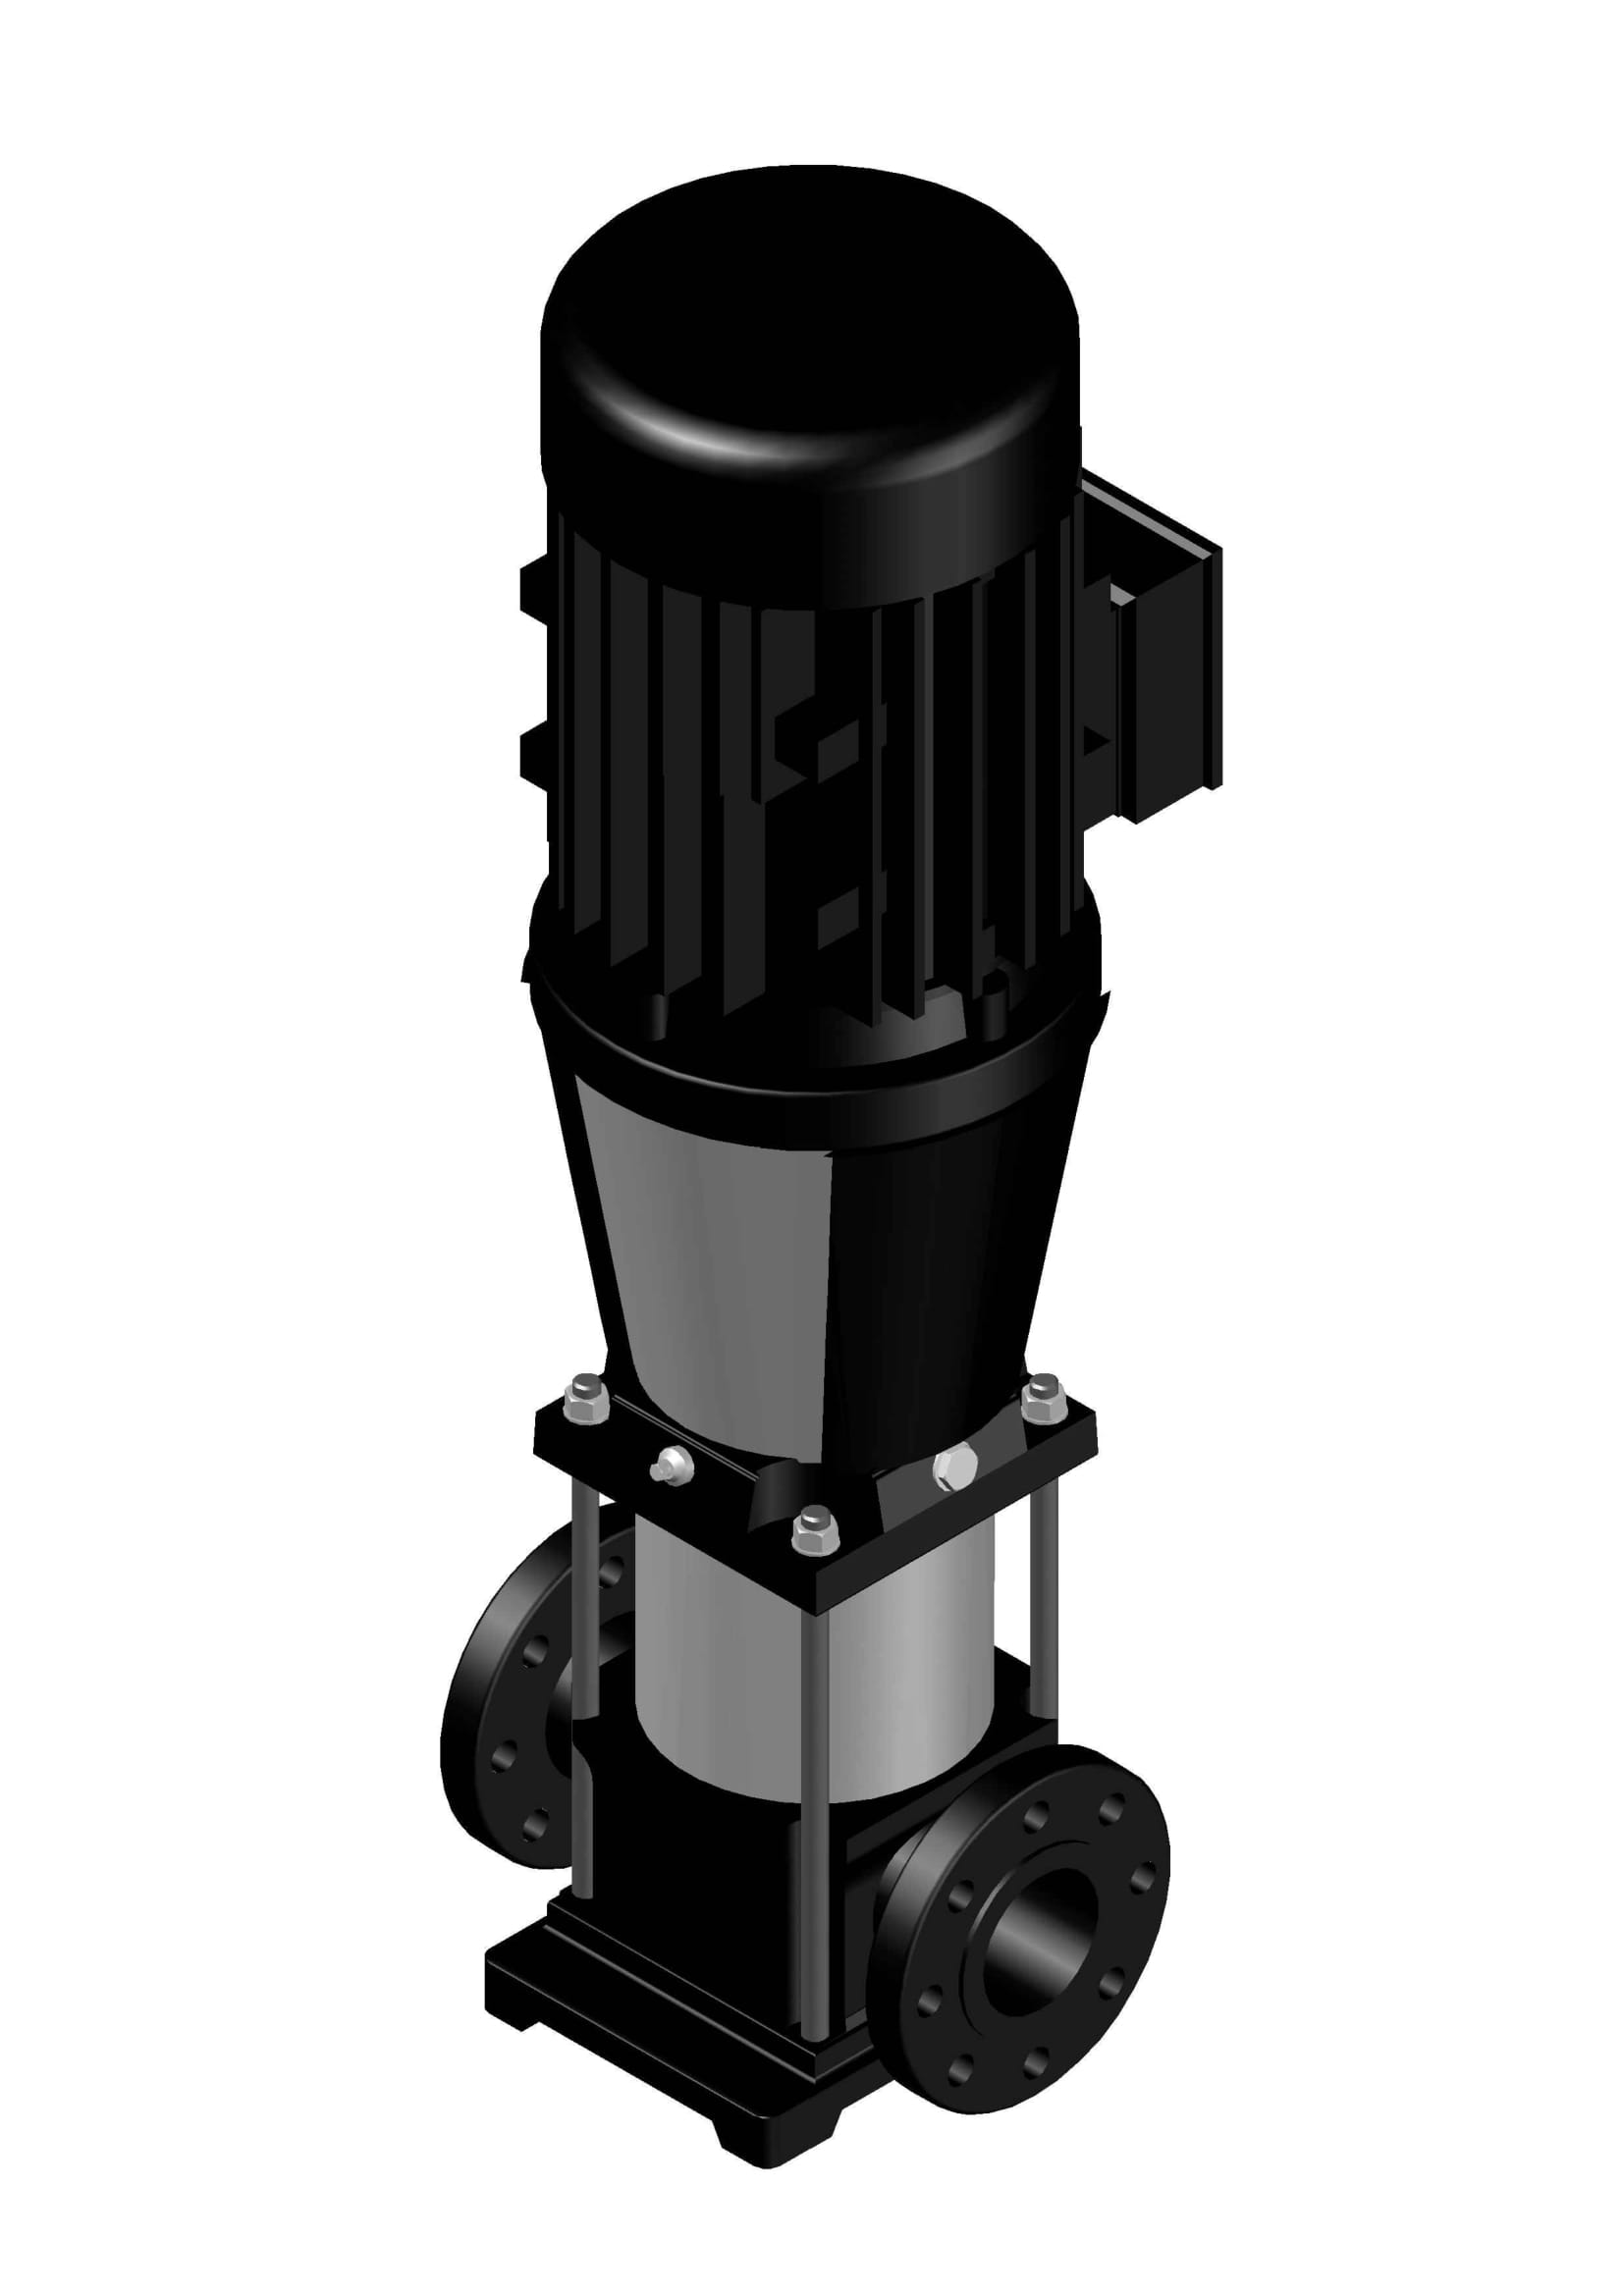 BV 90-02-02